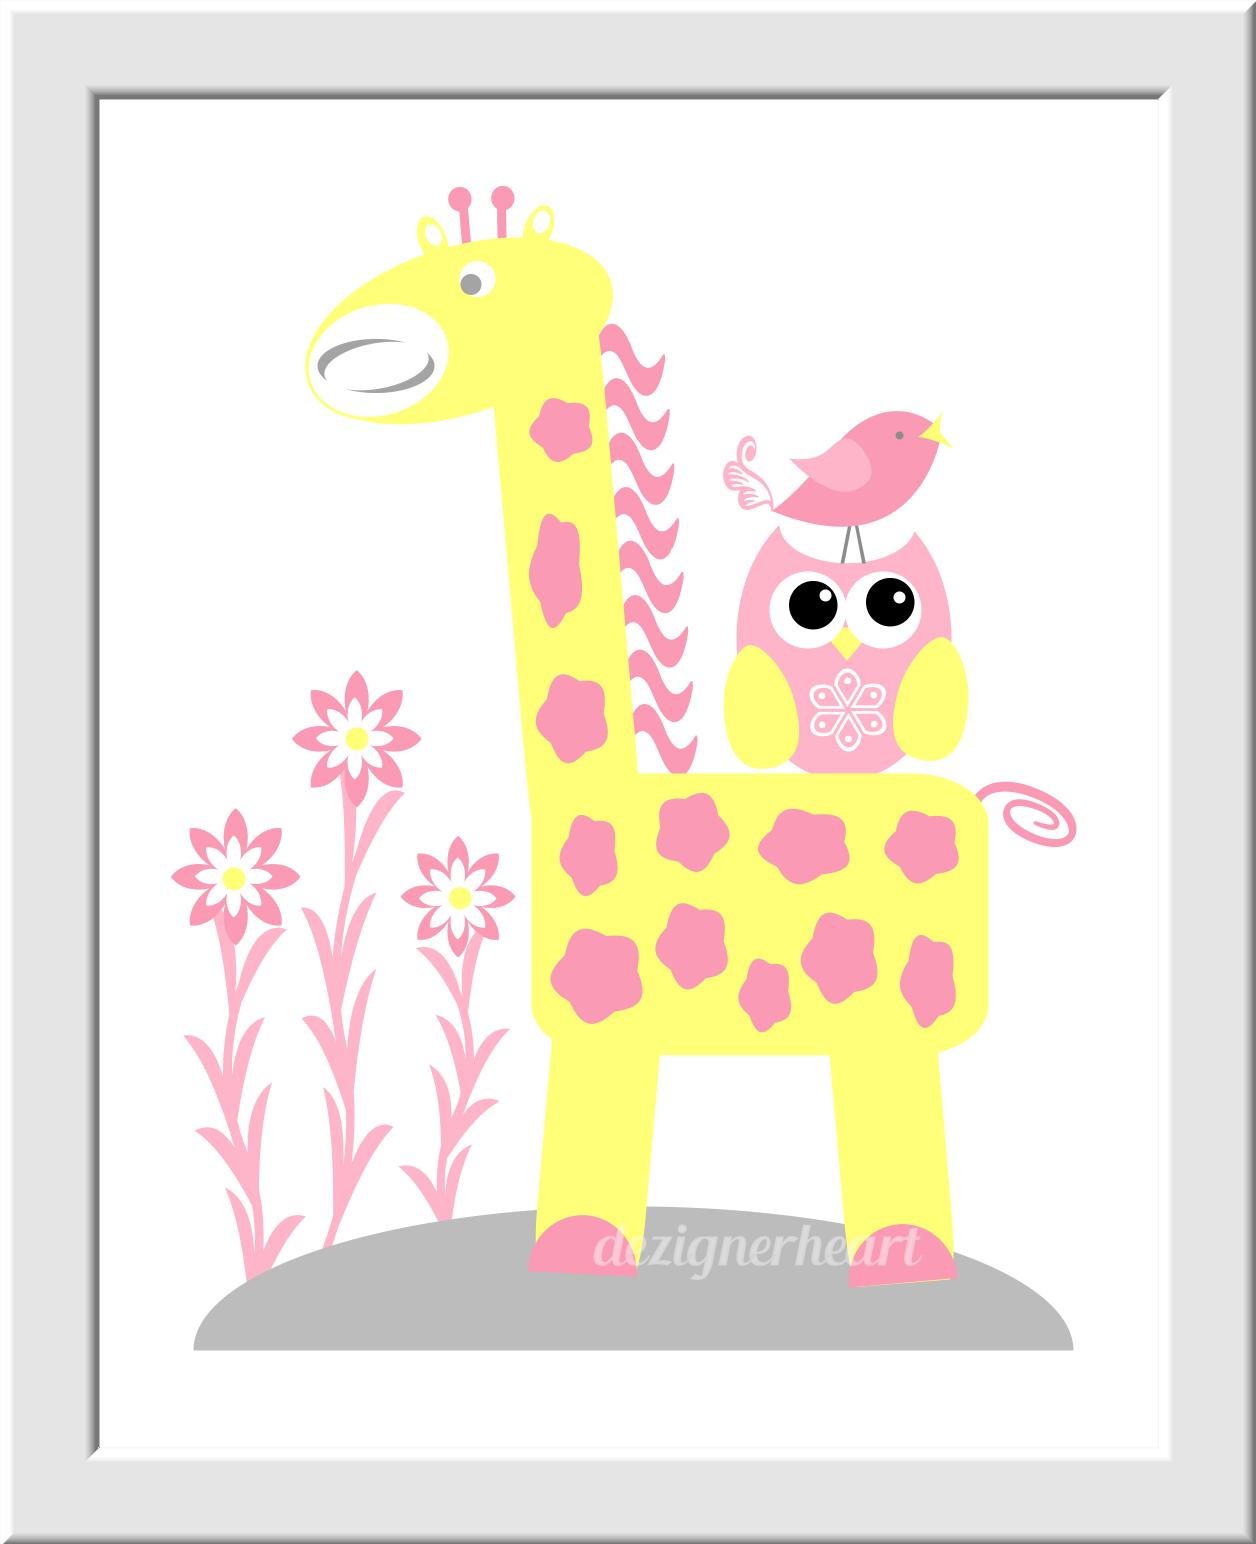 YELLOW Baby Nursery Wall Art Pink Gray Yellow Elephant Giraffe ...